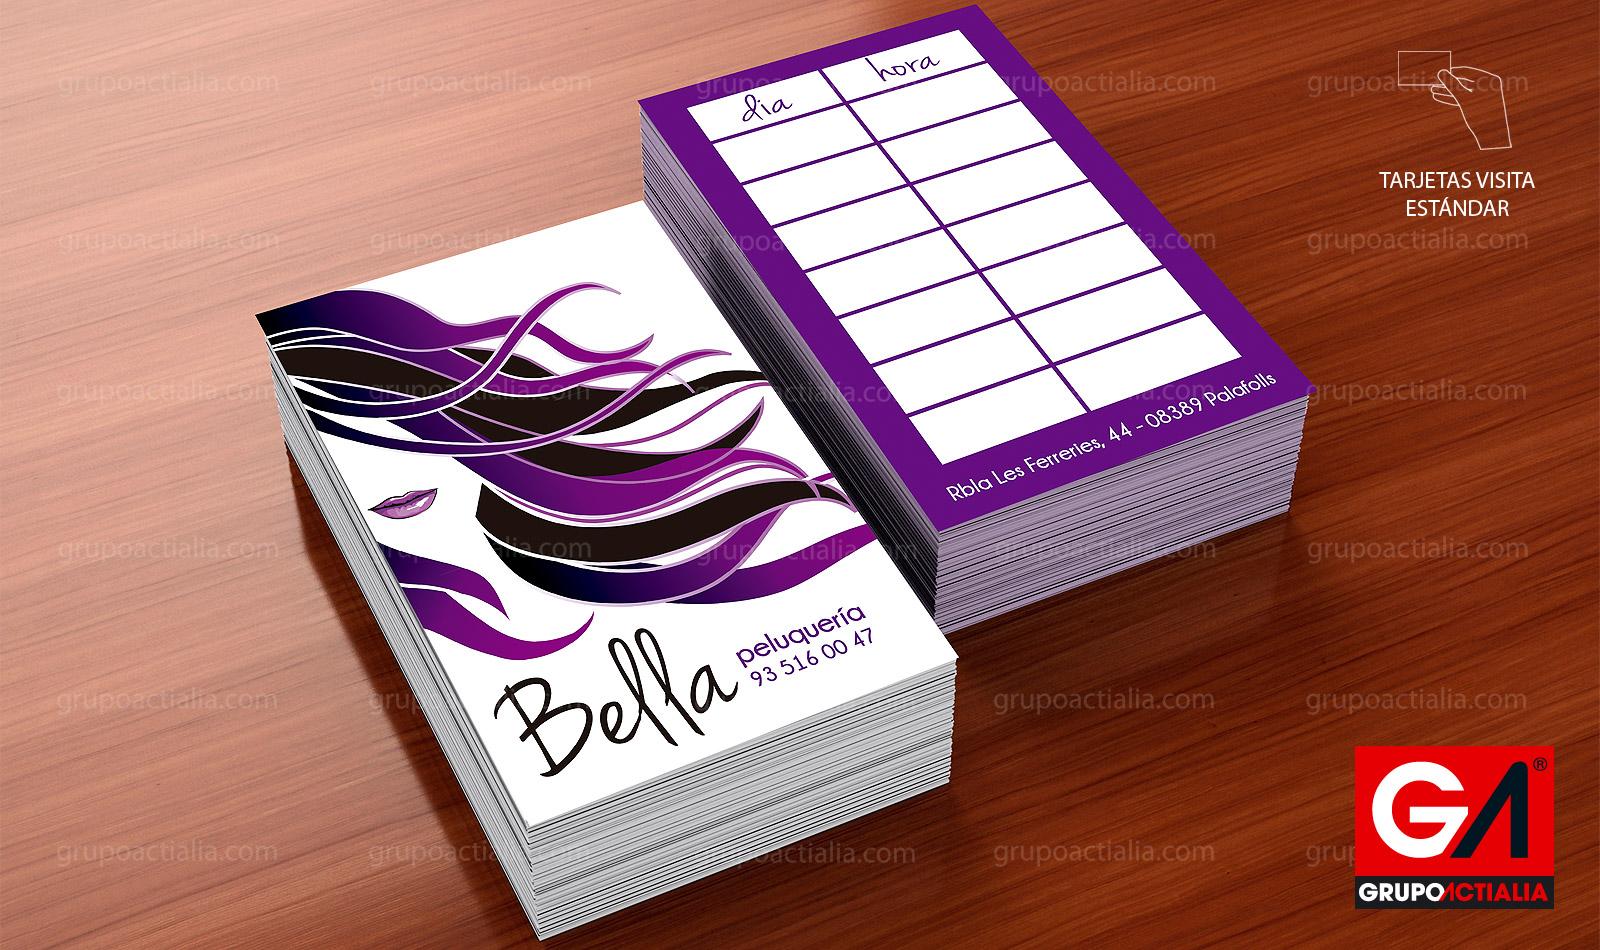 Desde 35 tarjetas visita est ndar dise o gr fico for Disenos para tarjetas